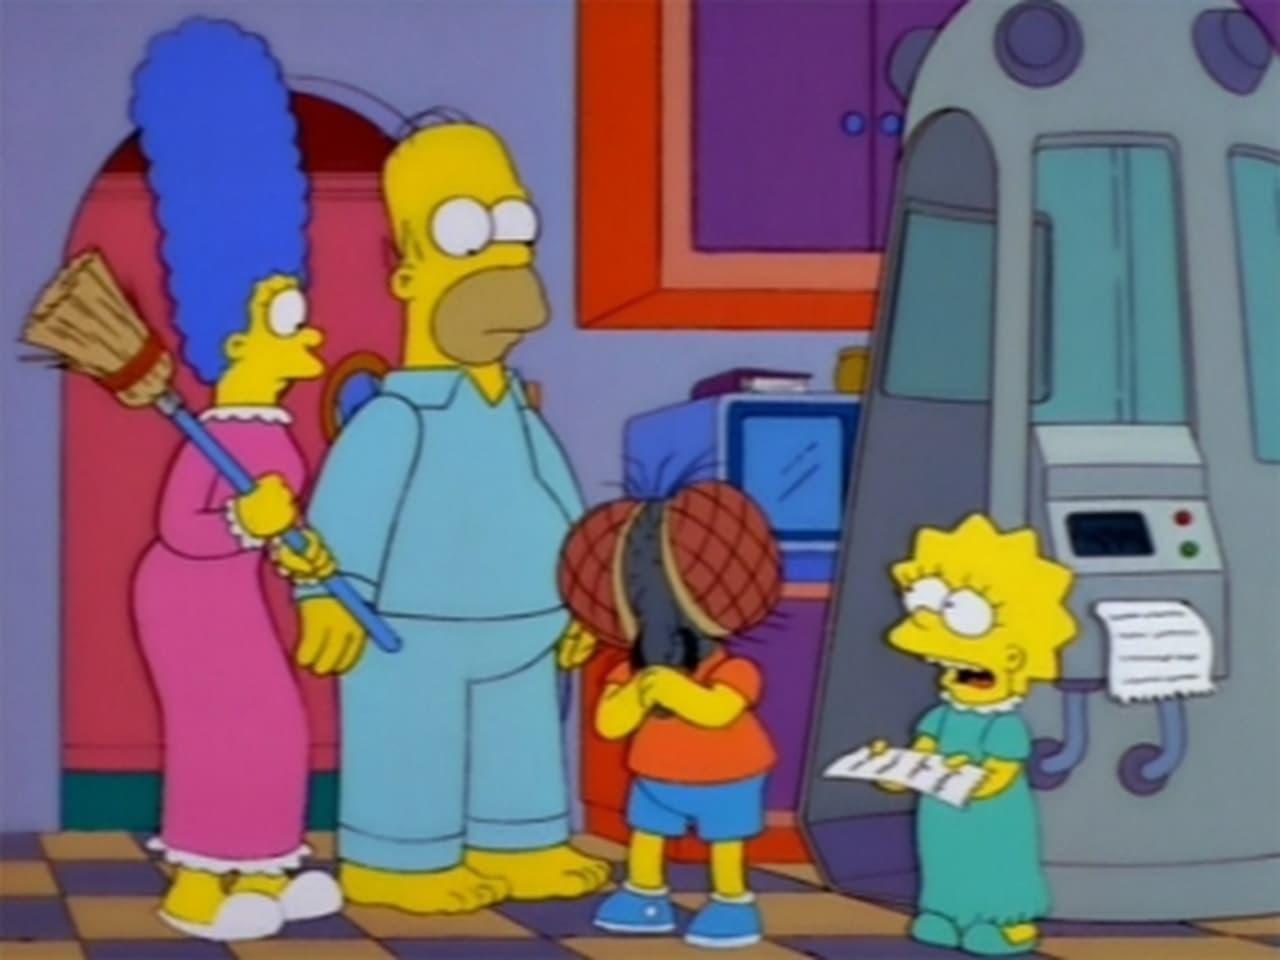 The Simpsons - Season 9 Episode 4 : Treehouse of Horror VIII